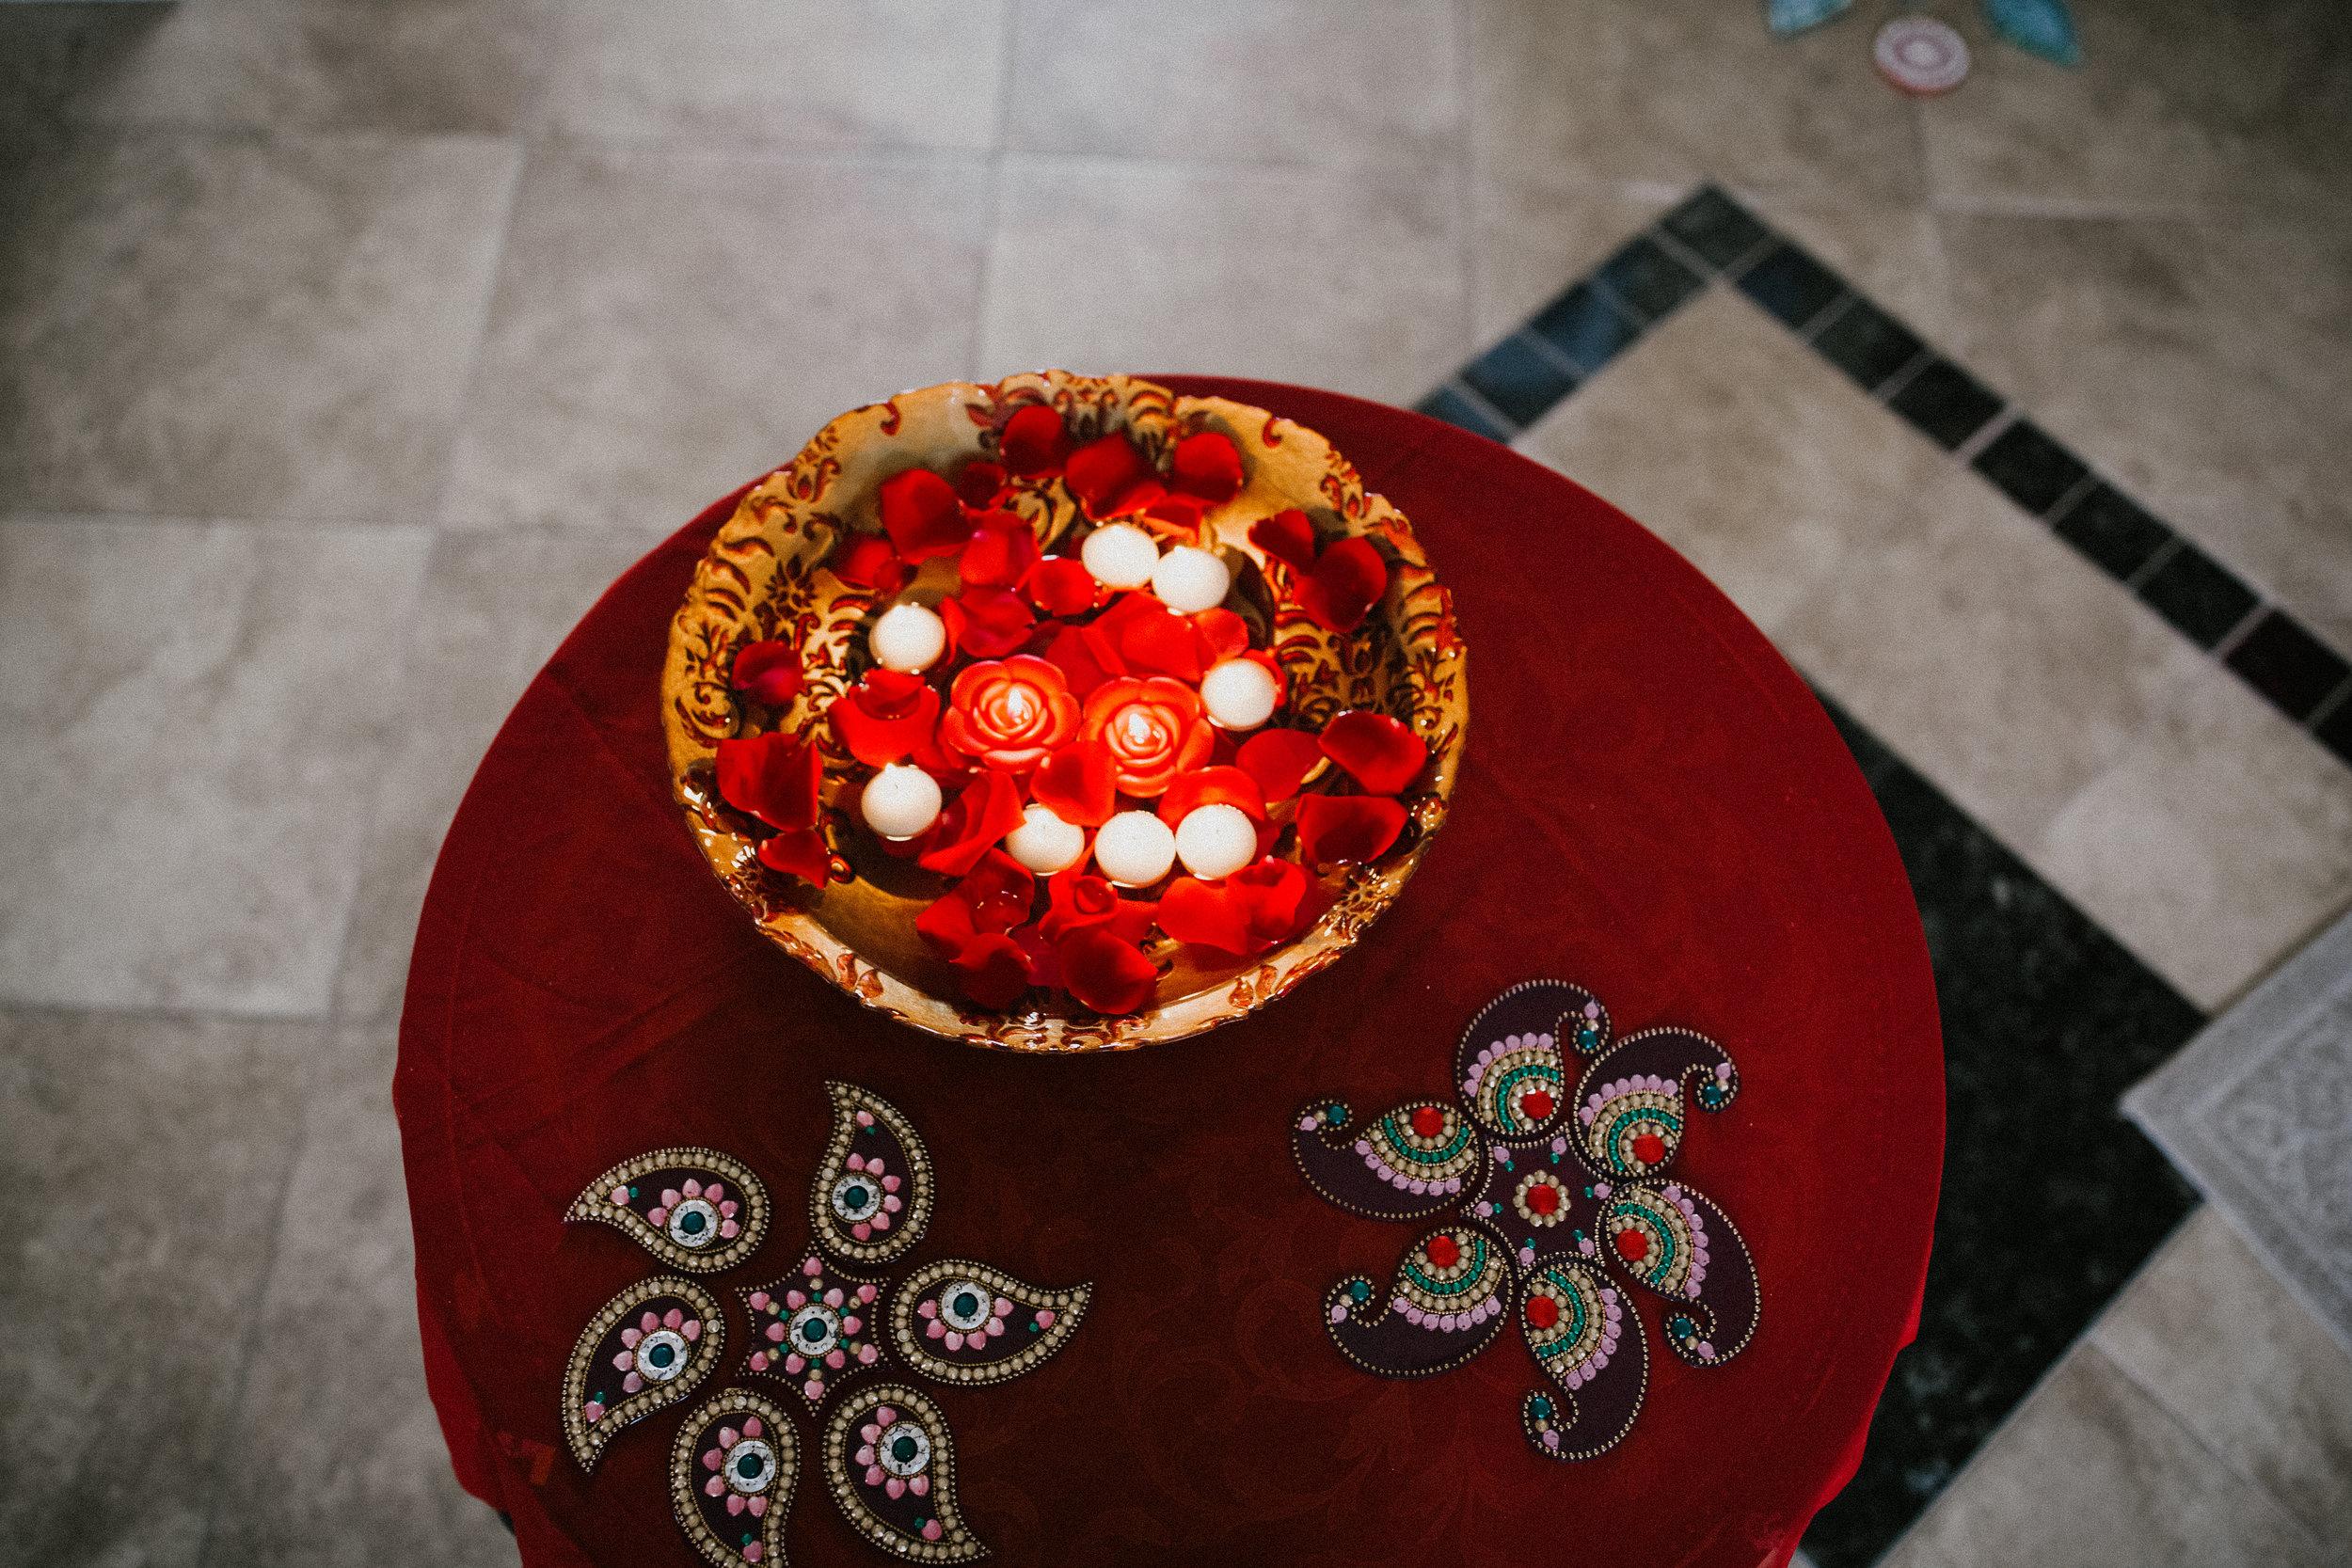 Aparna-Ankit-Patel-Mehndi-Wedding-Photos-0005.jpg